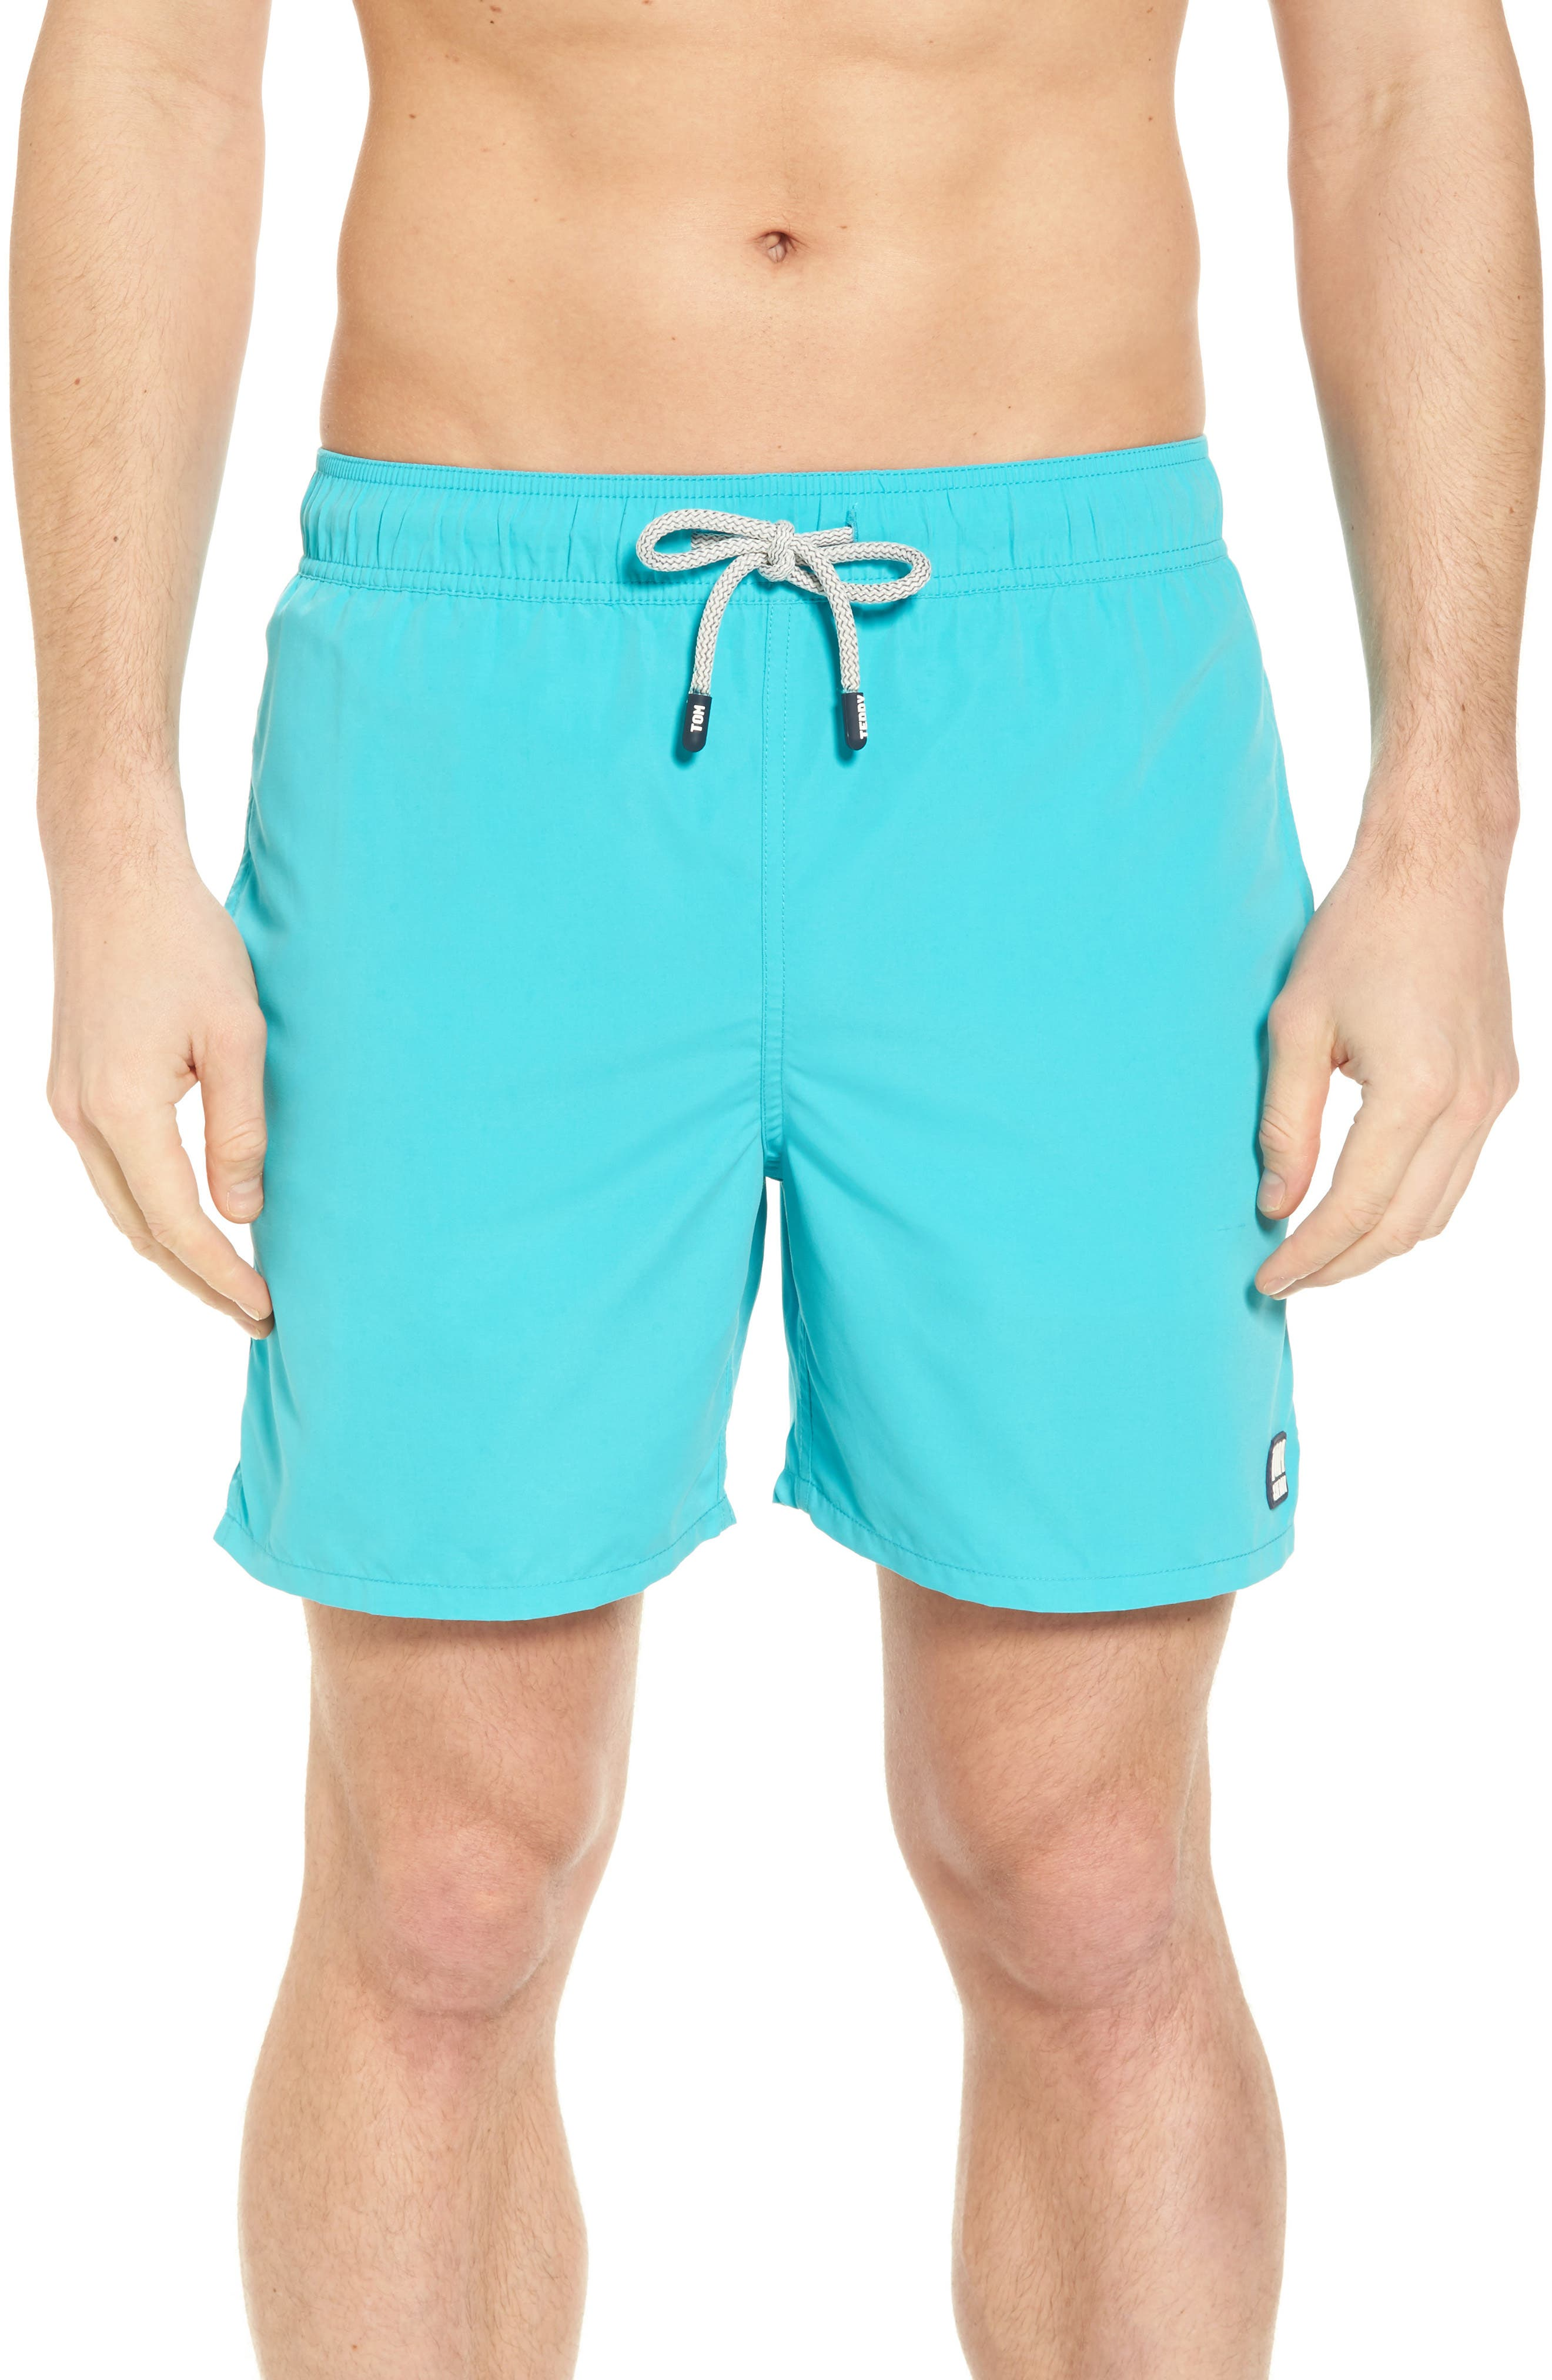 Solid Swim Trunks,                         Main,                         color, 439